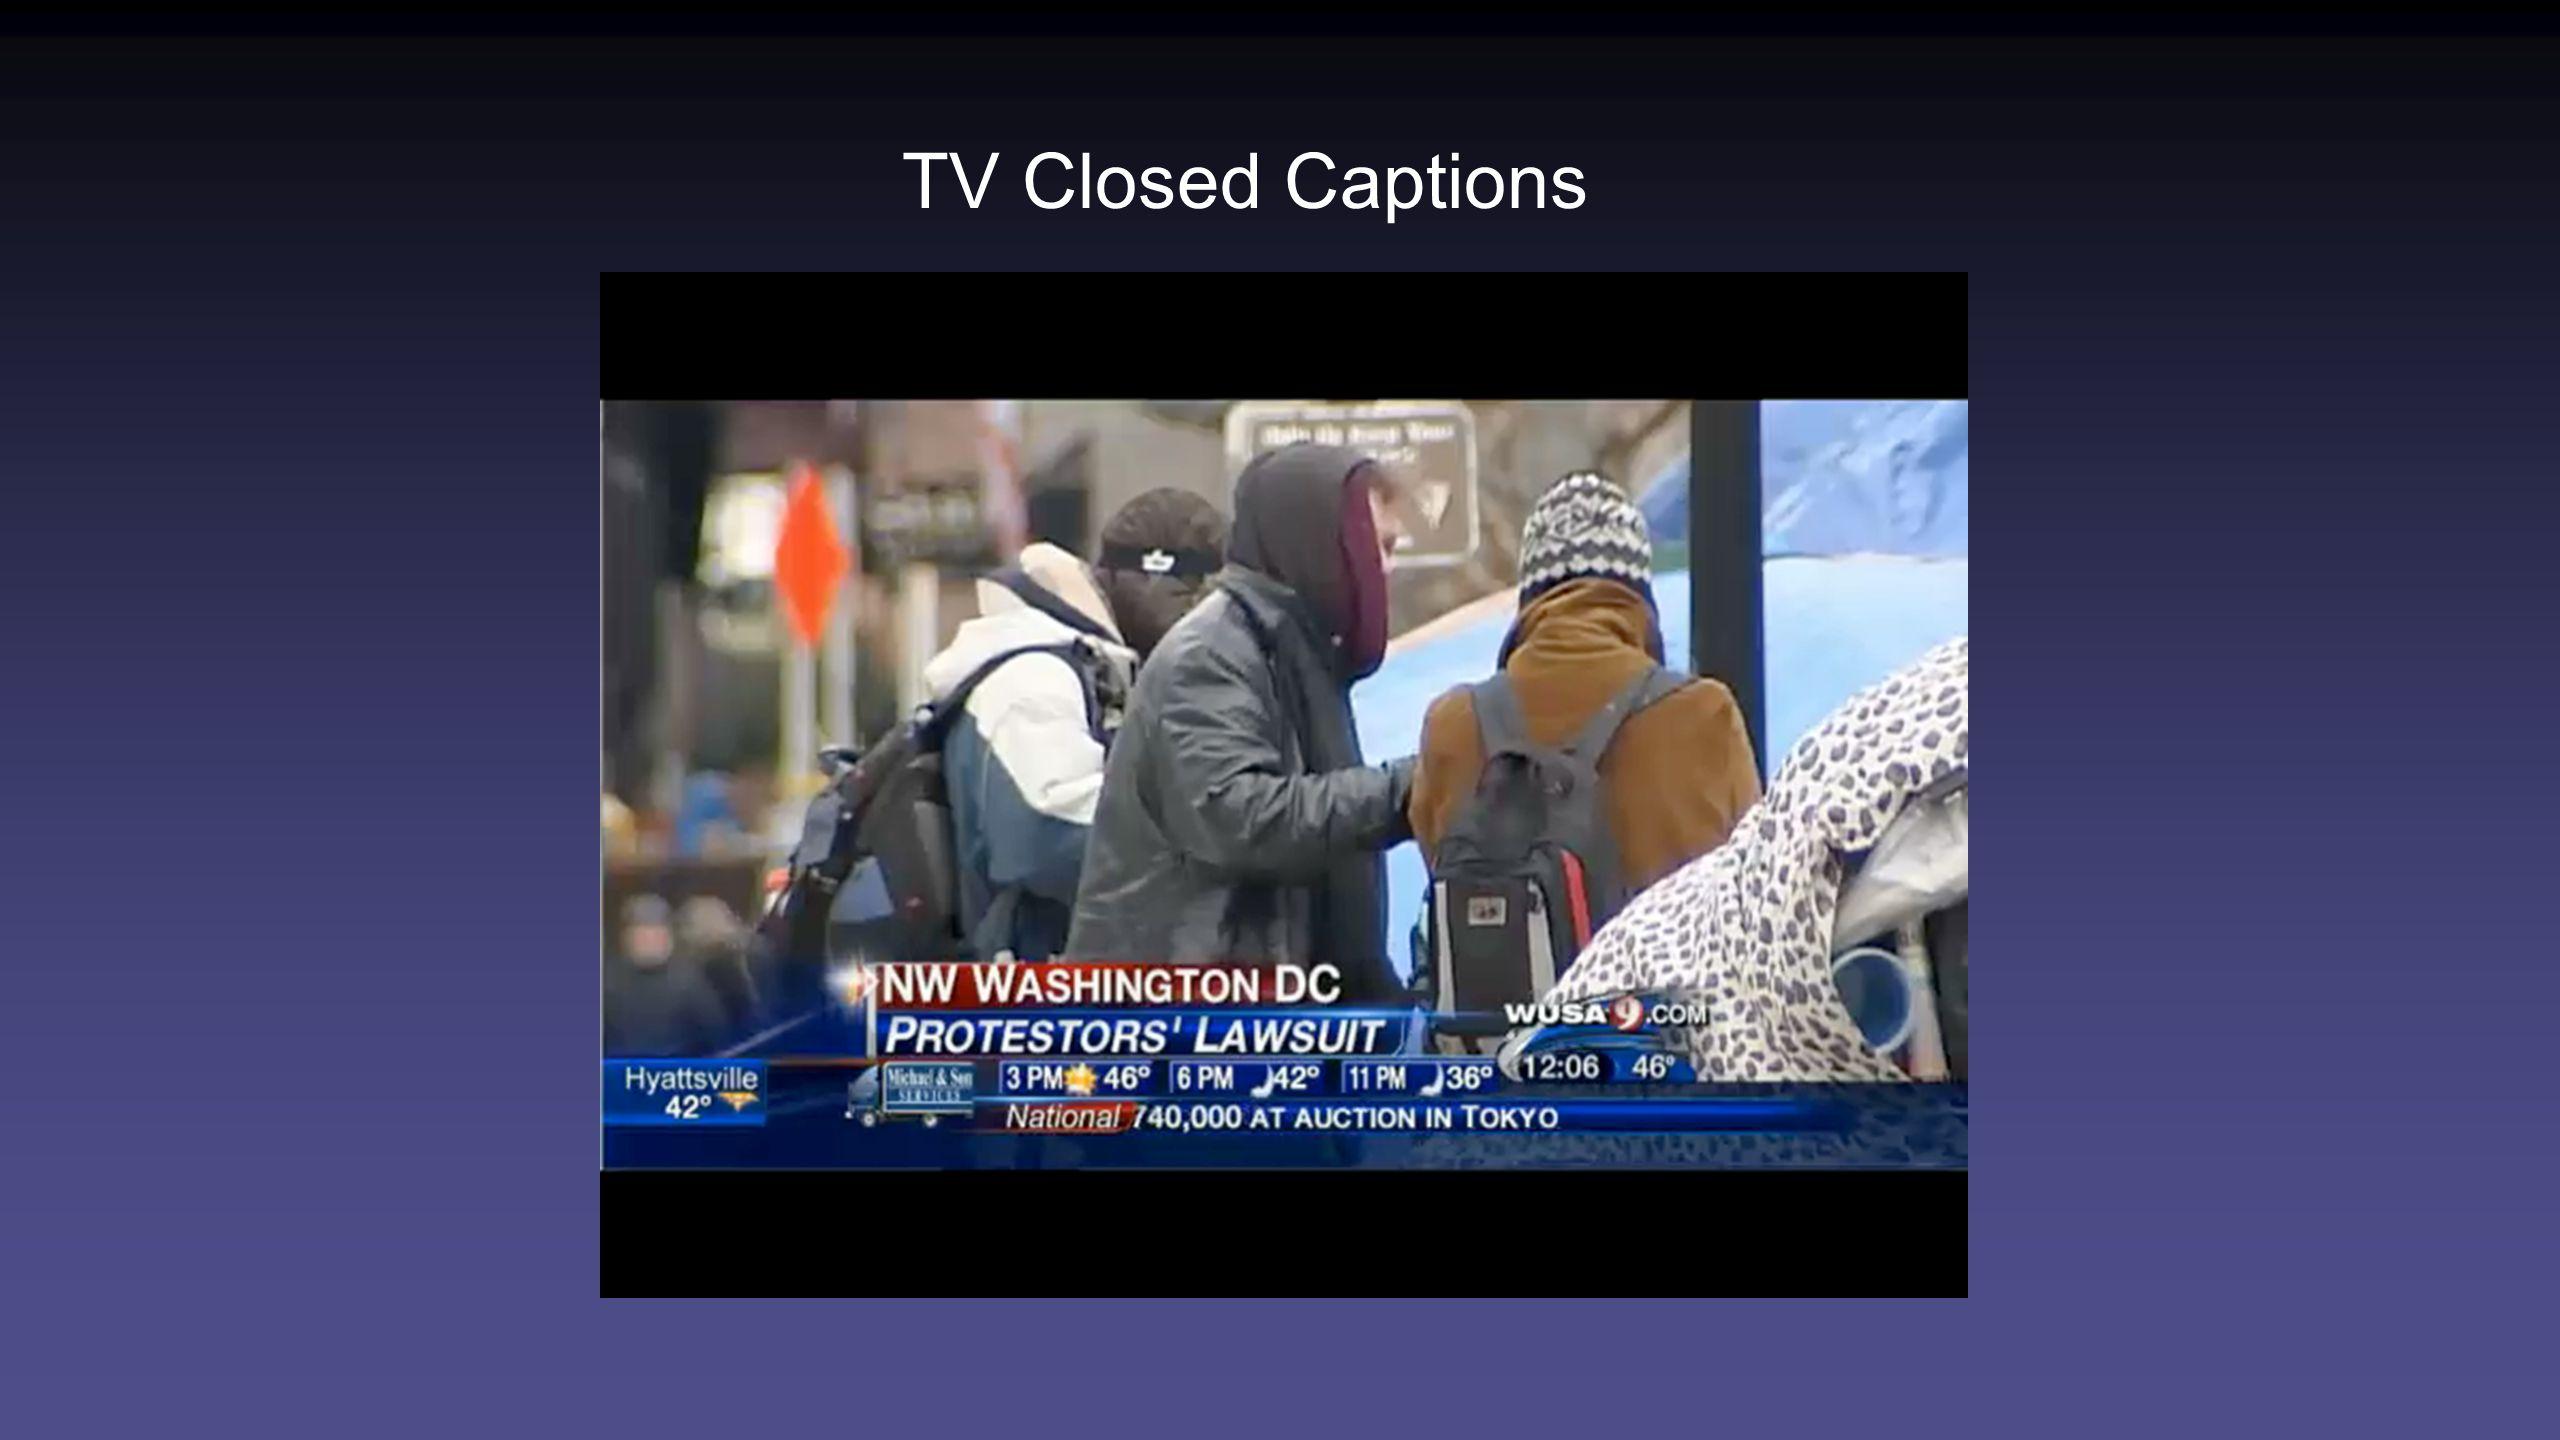 TV Closed Captions